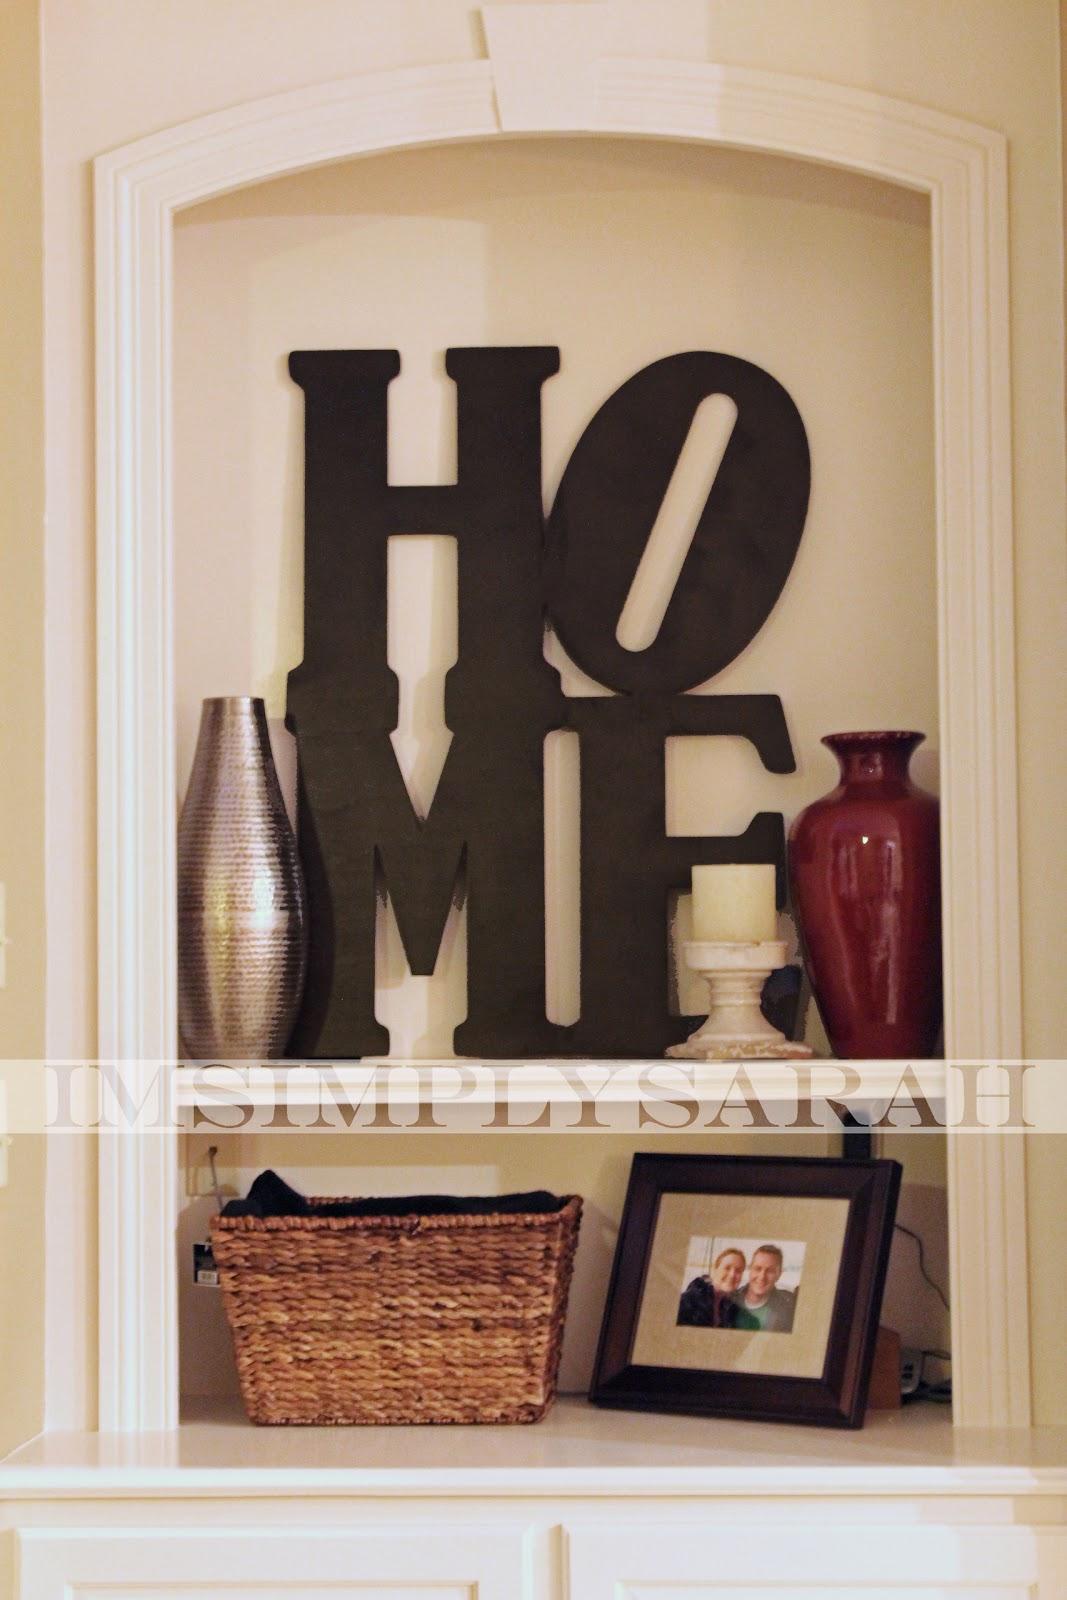 wall barn pottery inspired room sign looks noel